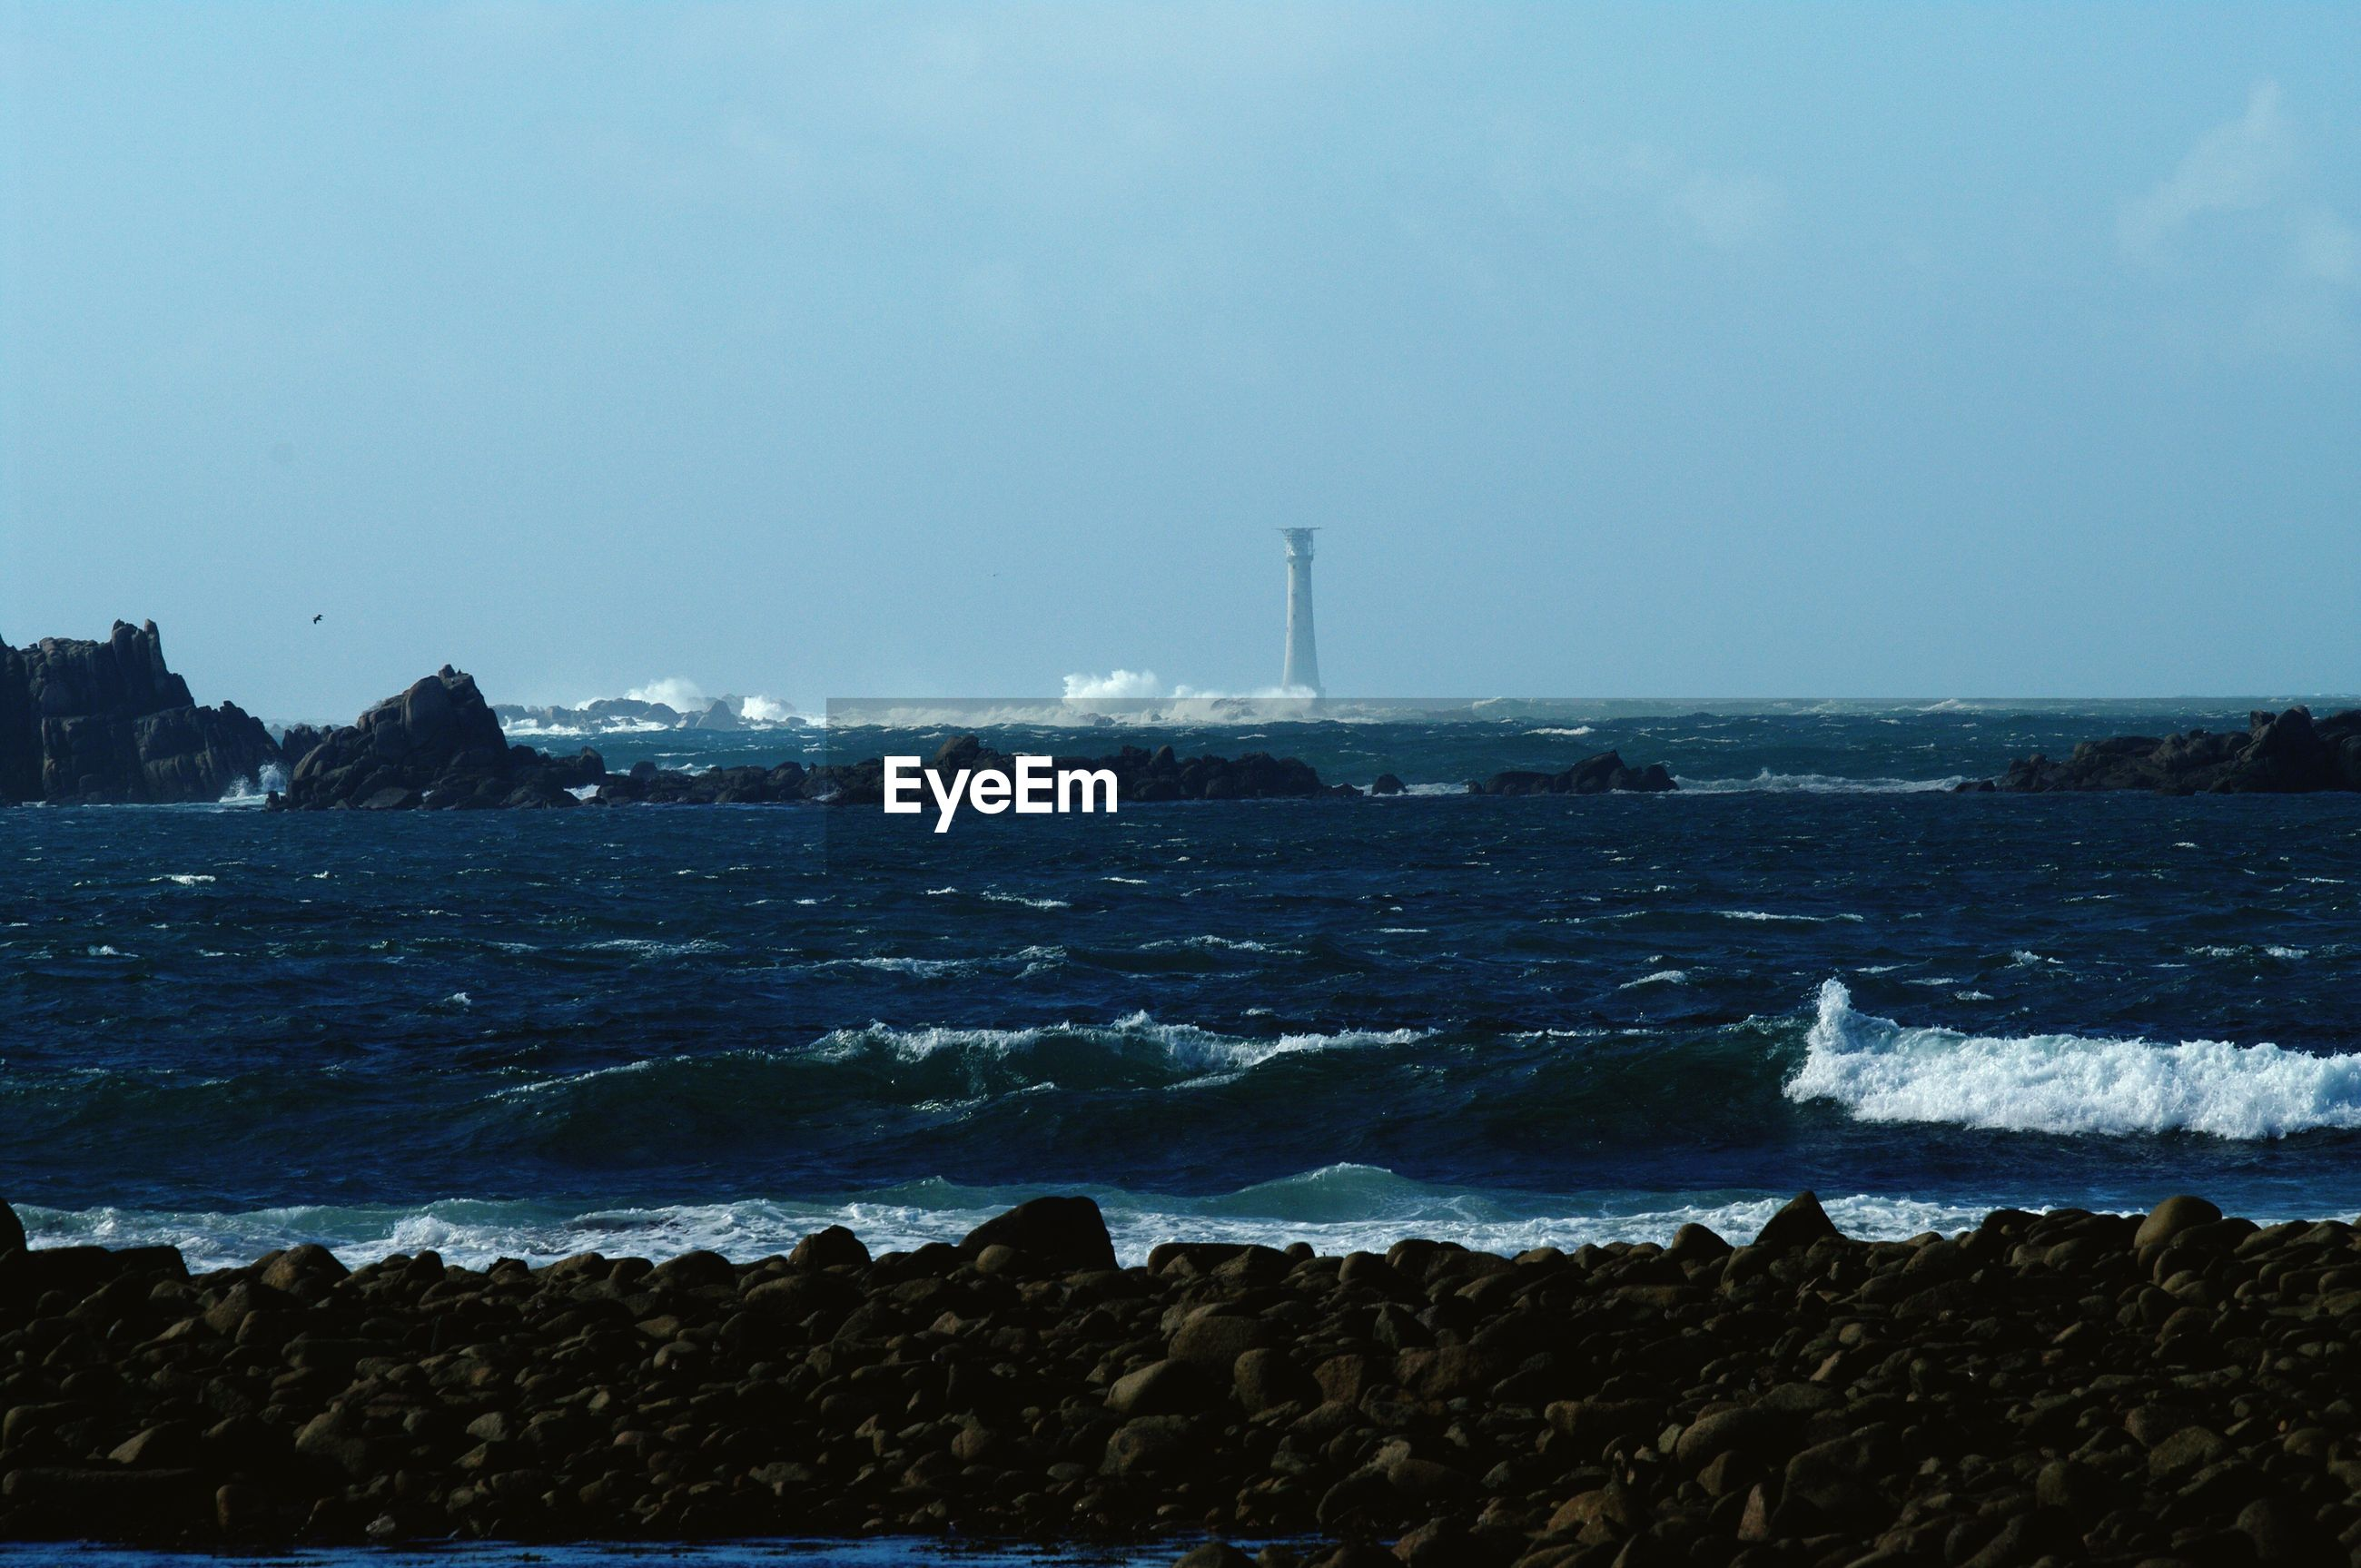 sea, blue, water, shore, tranquil scene, beach, tranquility, nature, scenics, wave, coastline, beauty in nature, day, distant, sky, outdoors, seascape, ocean, remote, no people, non-urban scene, solitude